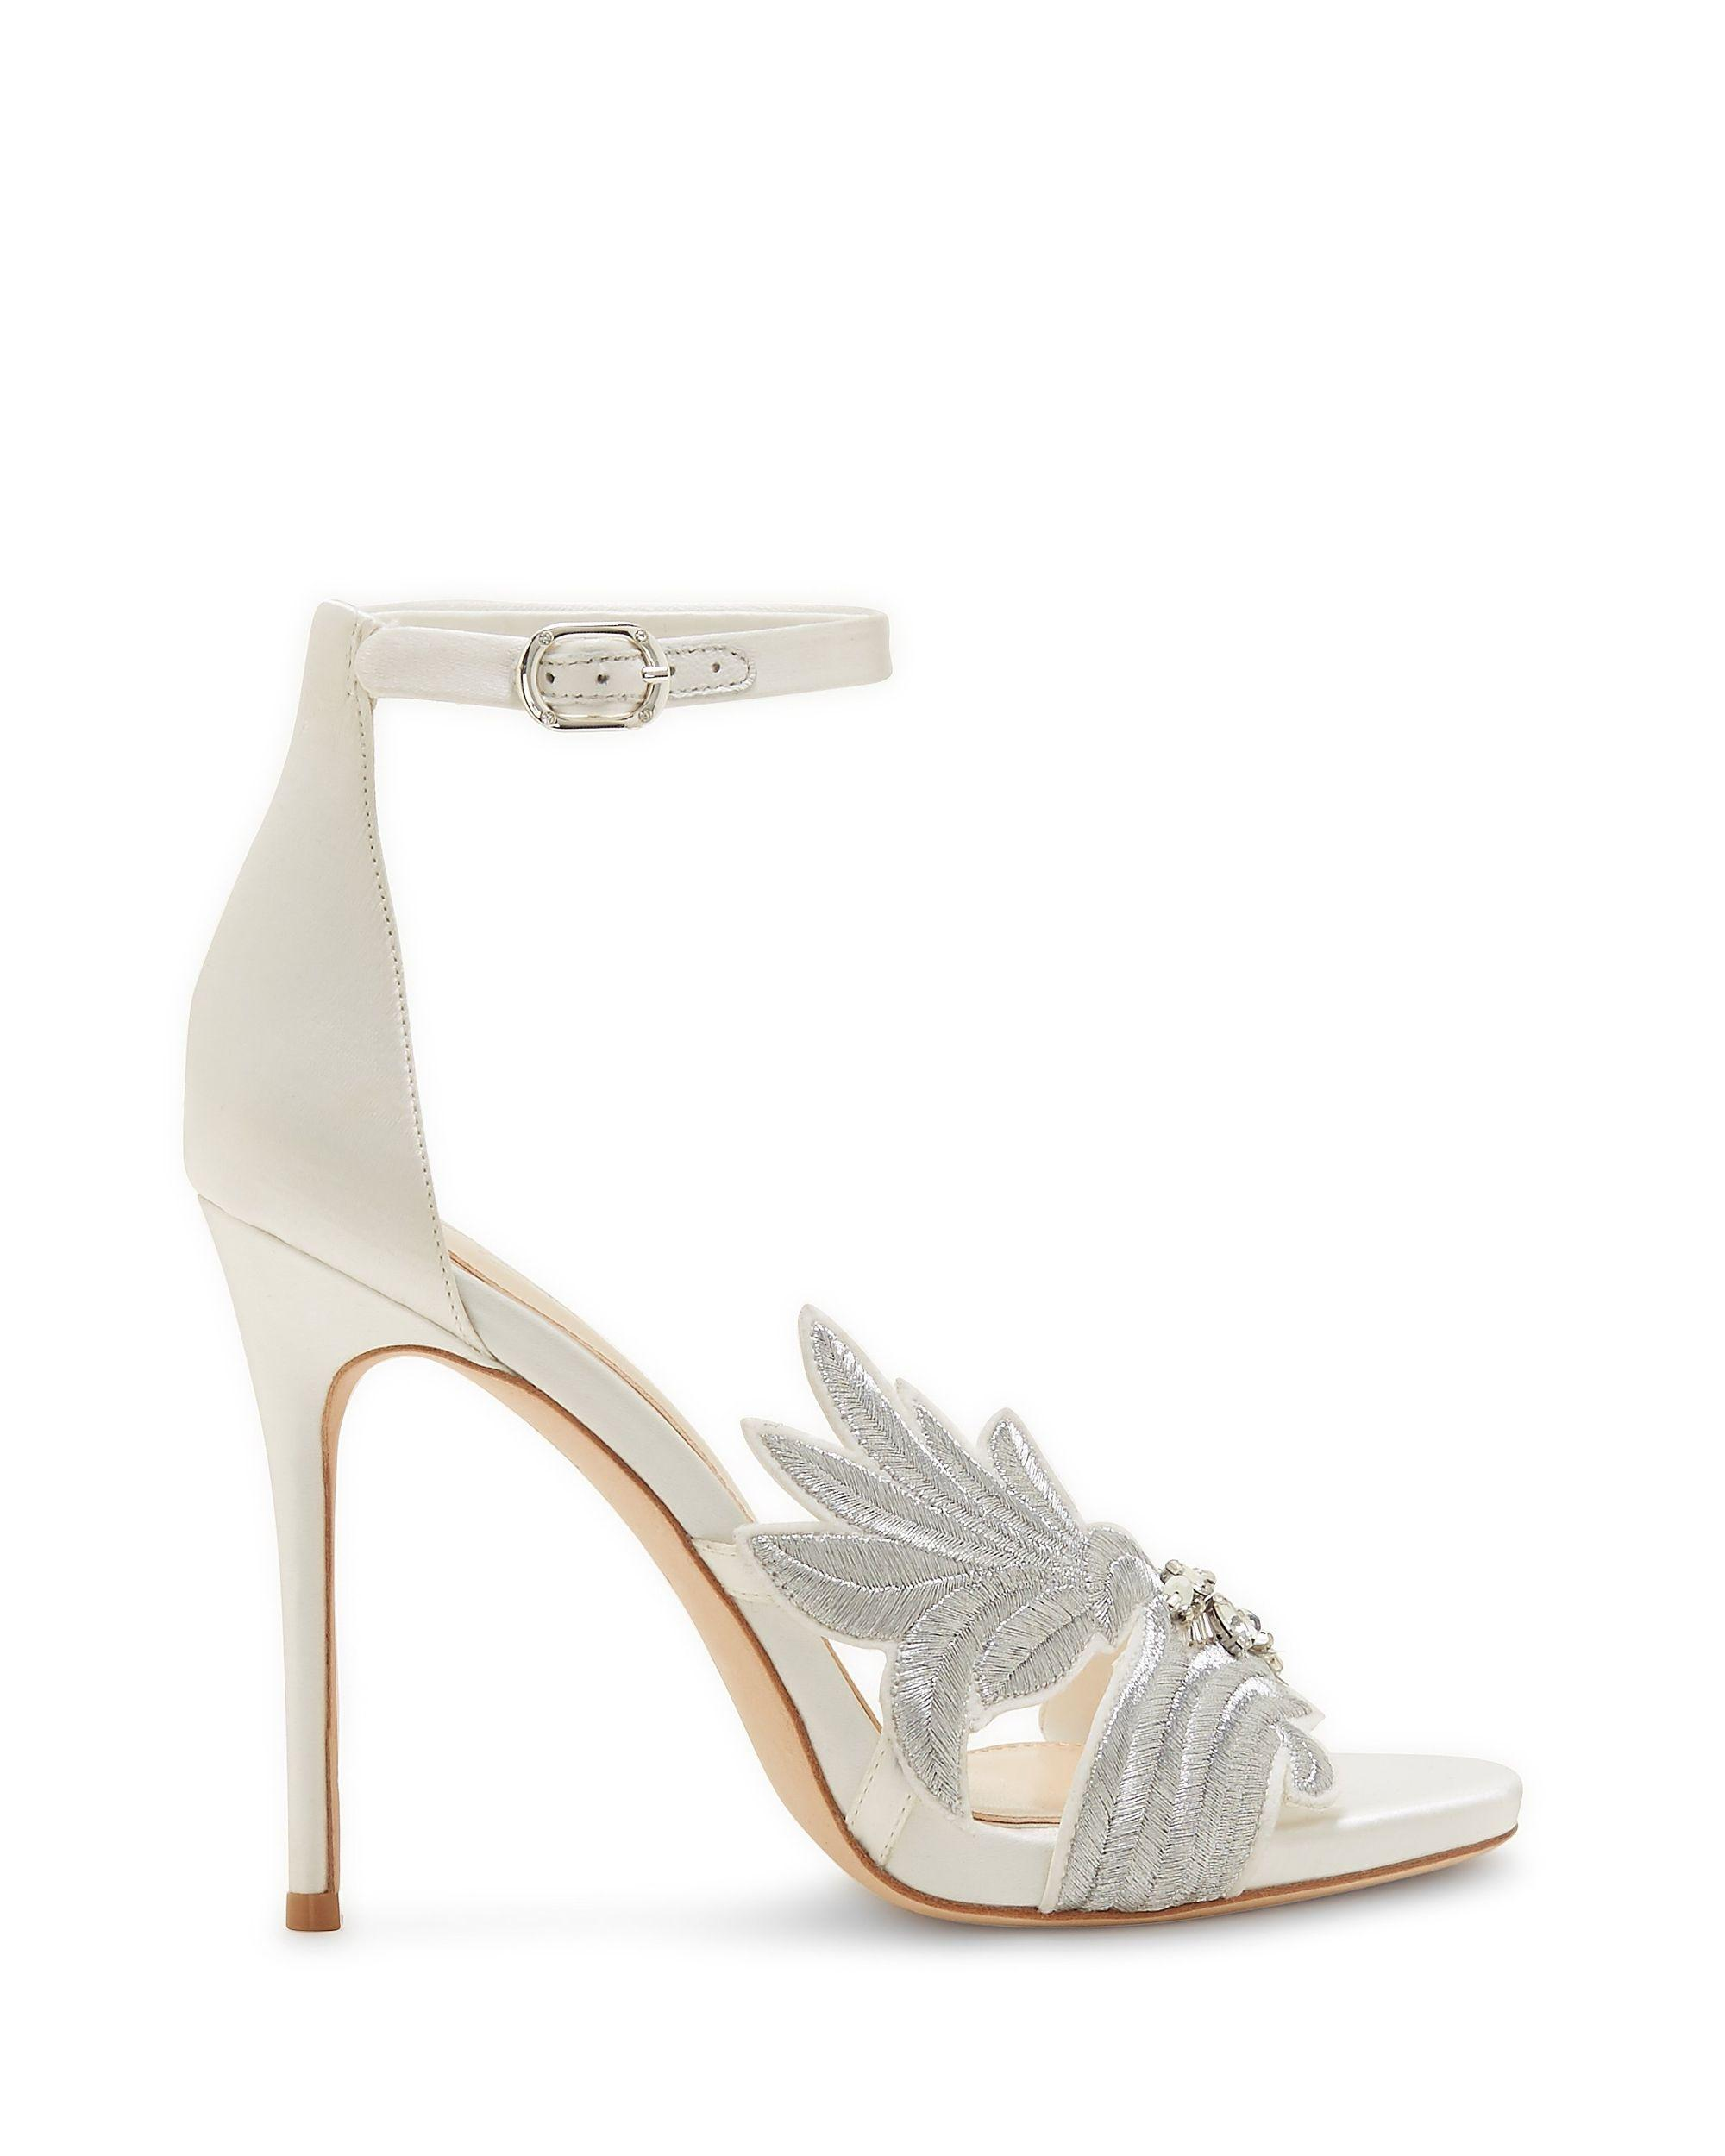 f3e96b8570c2 Lyst - Vince Camuto Imagine Dayanara – Embroidered Sandal in White ...